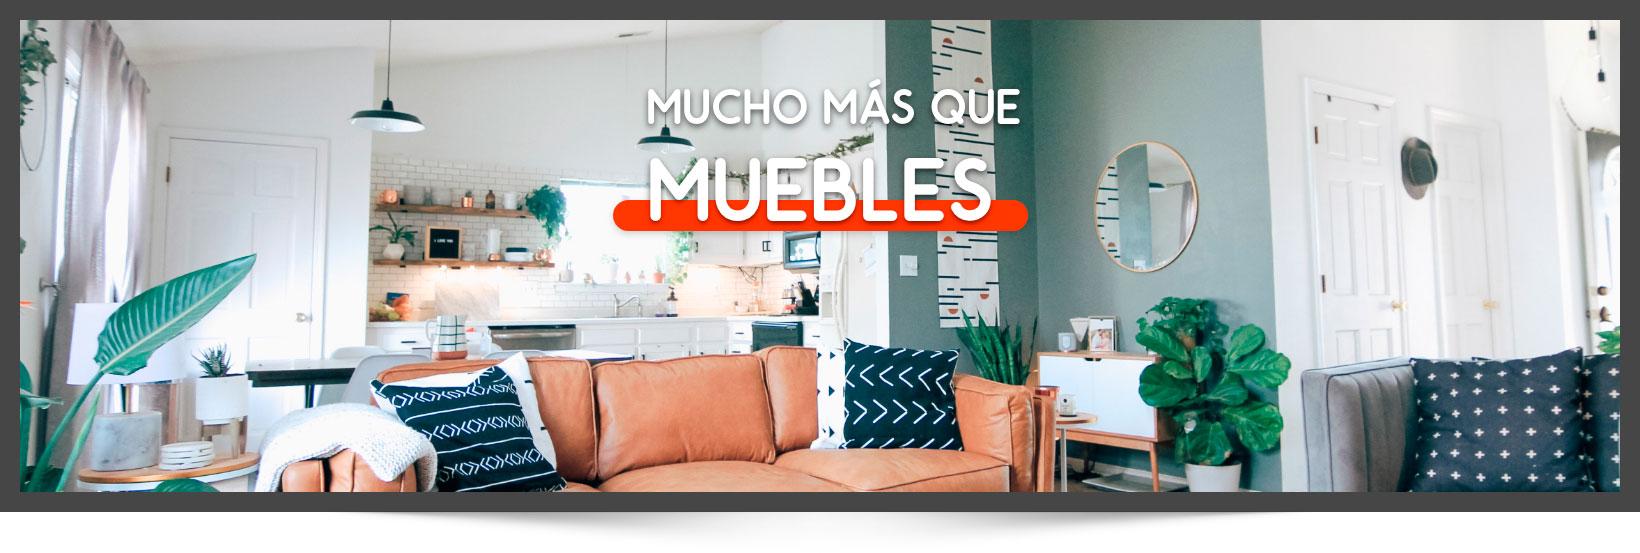 muebles almeria